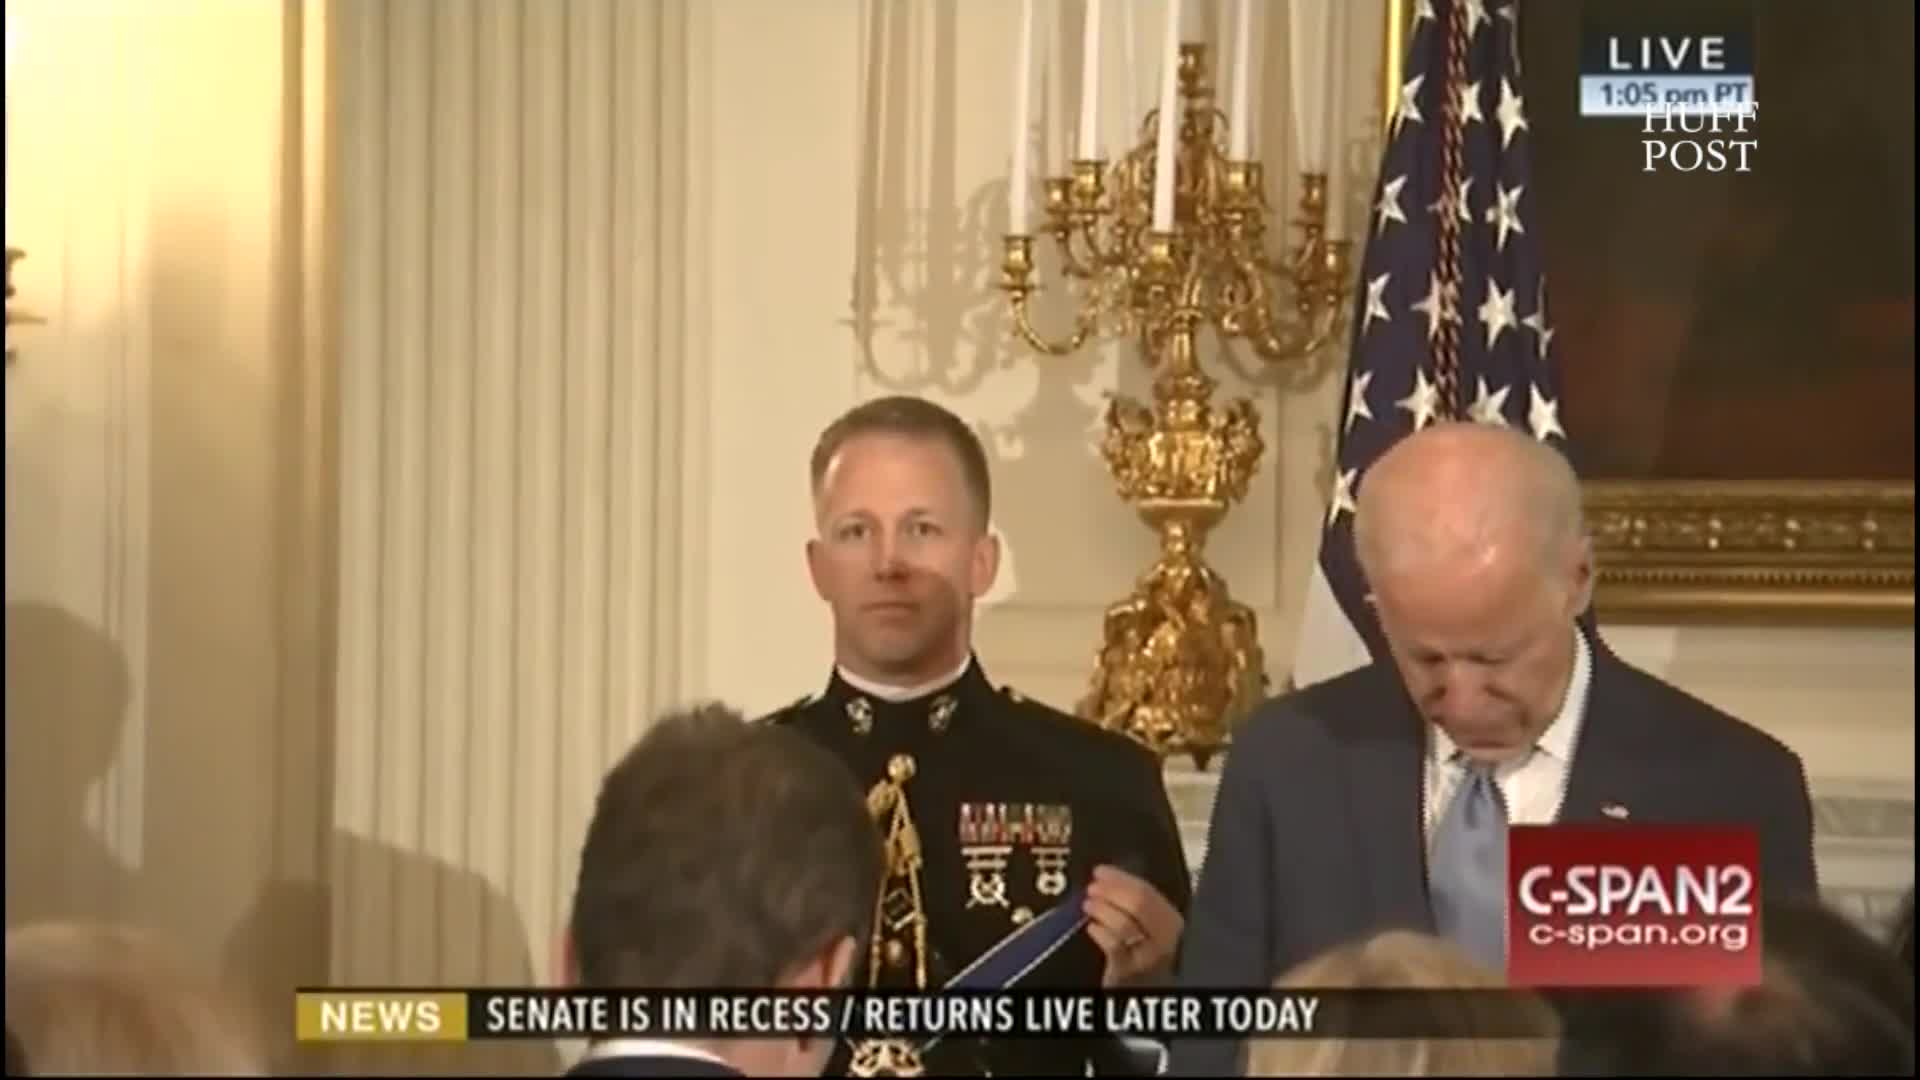 Obama Awards Biden The Presidential Medal Of Freedom In Surprise White House Tribute